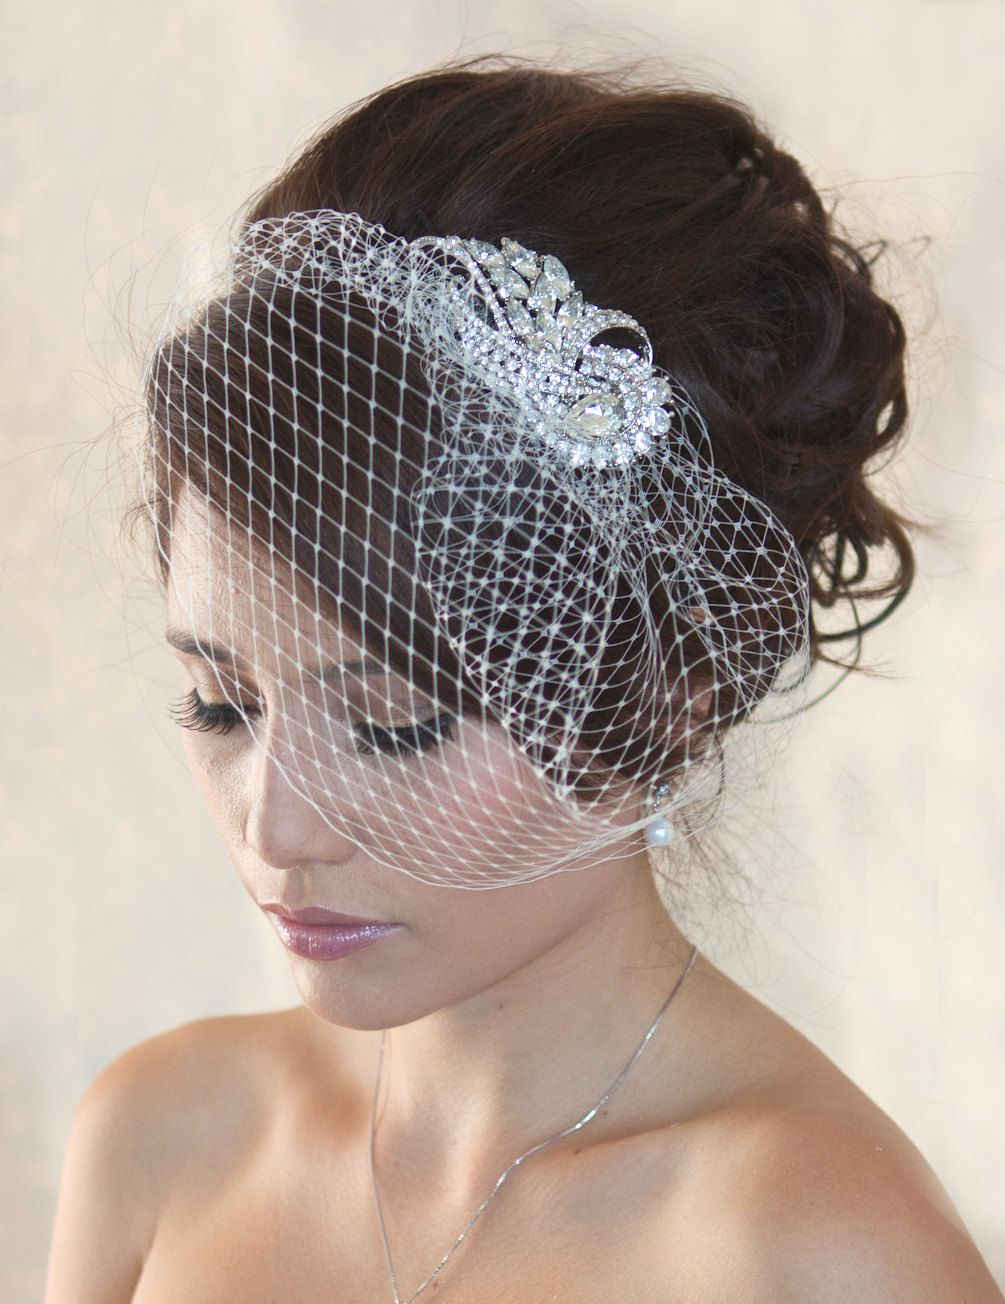 wedding birdcage veil with crystal rhiestone by wearableartz 65 00